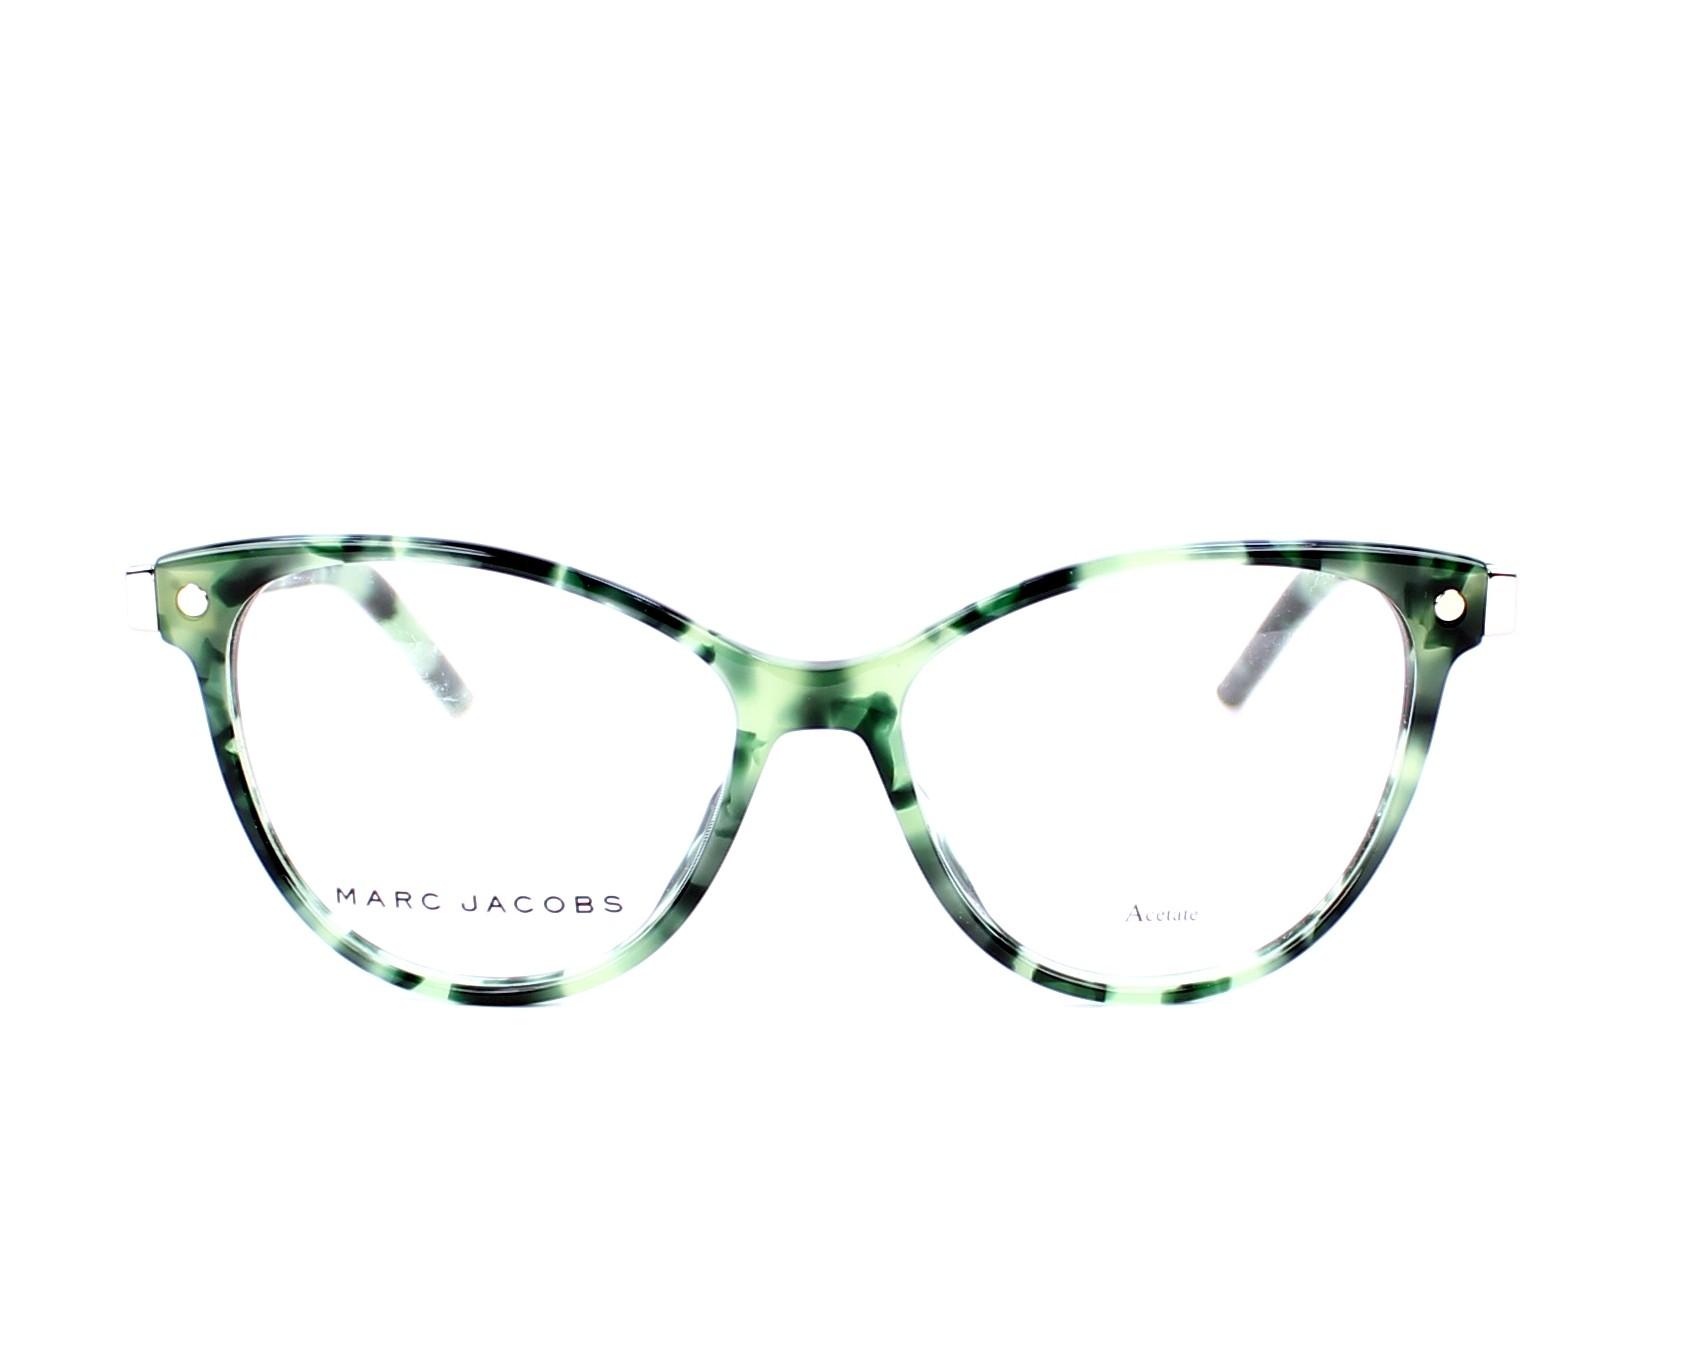 Marc Jacobs Eyeglasses Marc 20 U1s Green